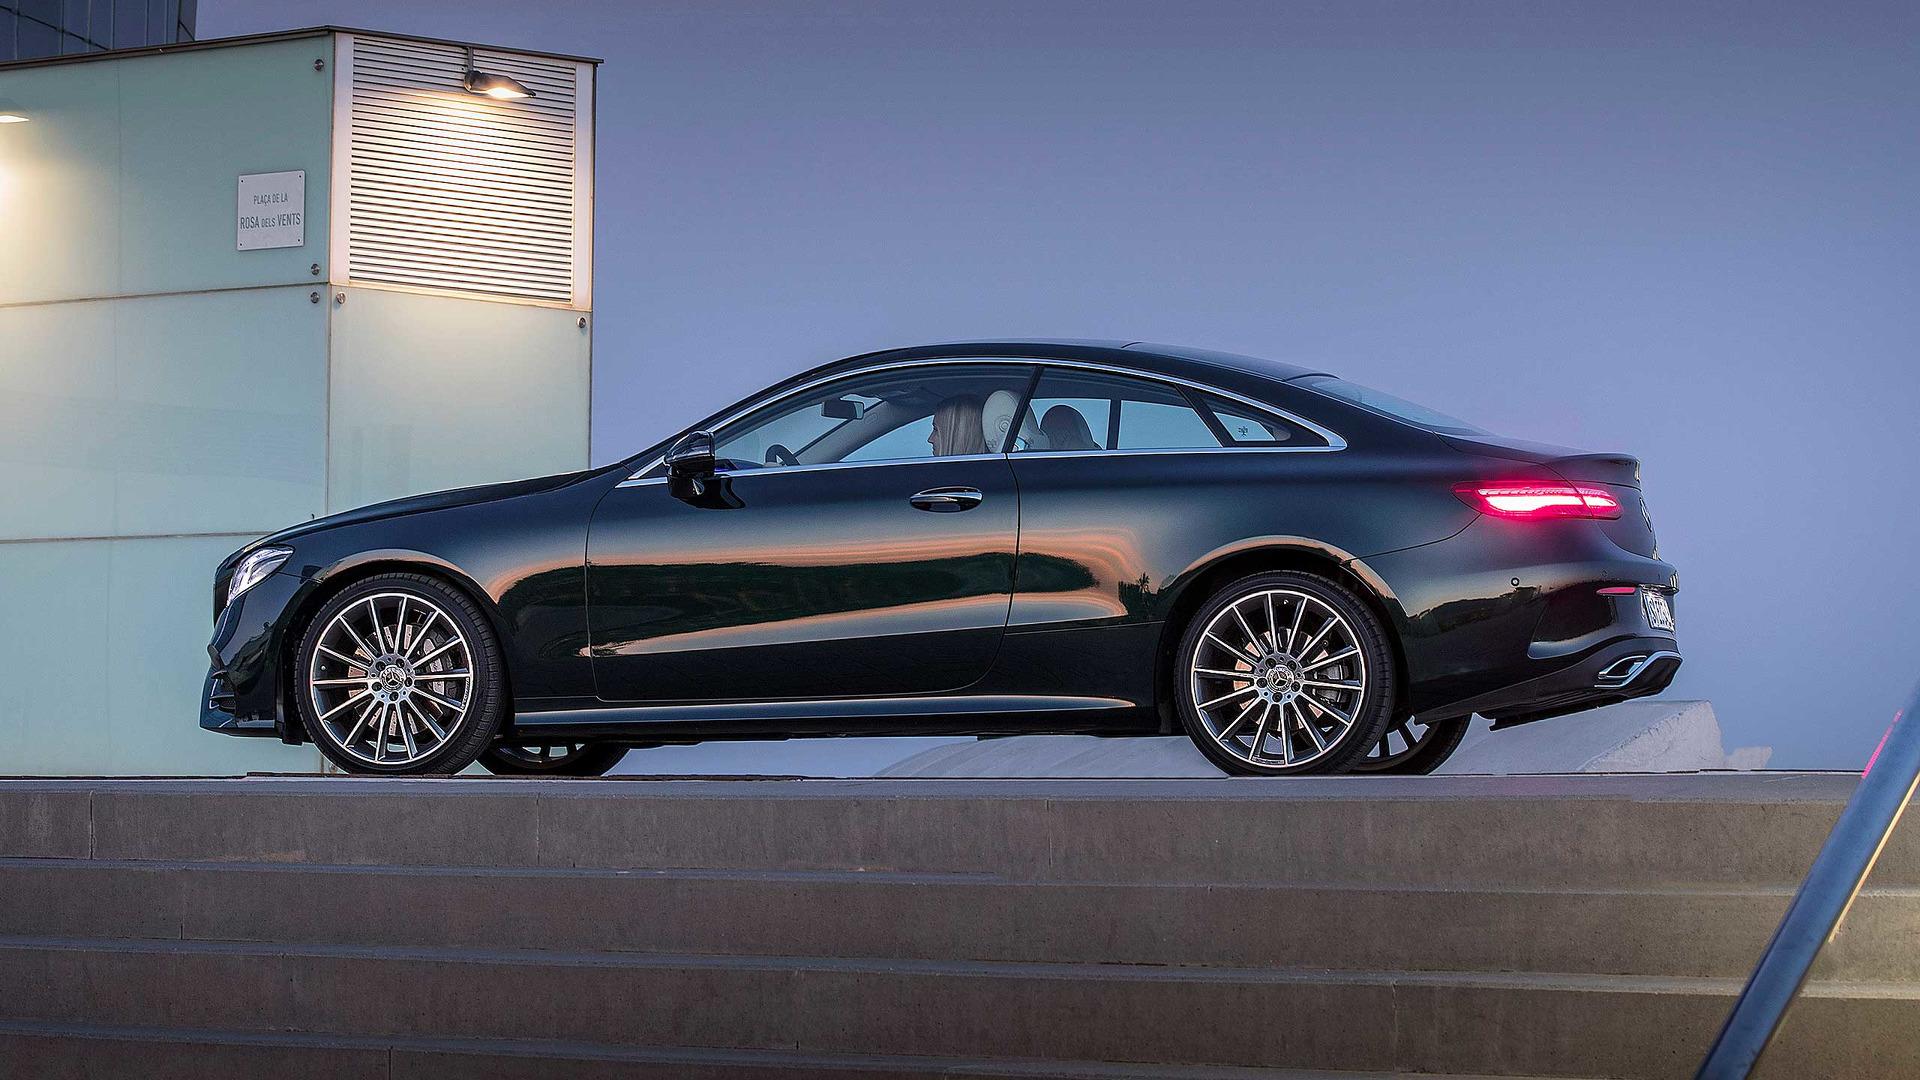 https://icdn-9.motor1.com/images/mgl/RjMzw/s1/2017-mercedes-benz-e-class-coupe-first-drive.jpg